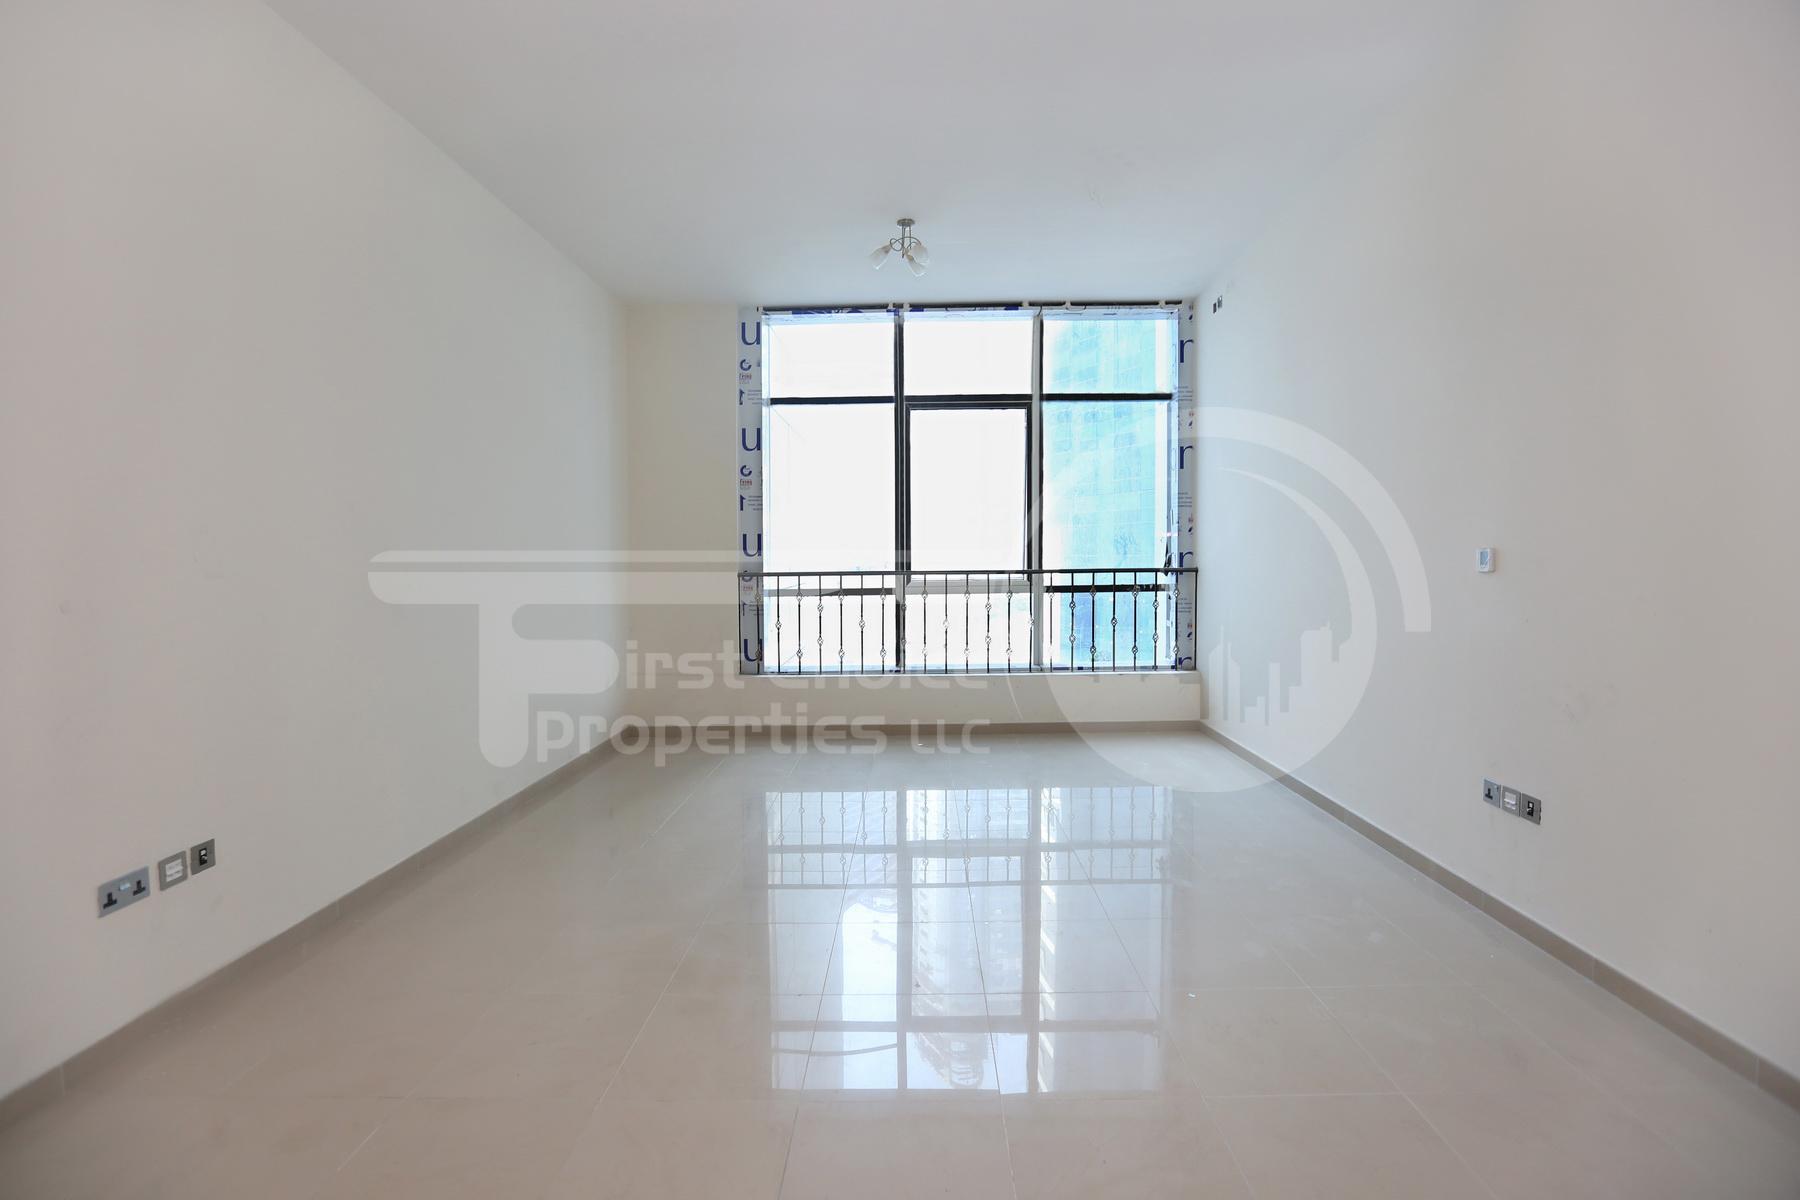 Studio Apartment - Abu Dhabi - UAE - Al Reem Island - Hydra Avenue.JPG